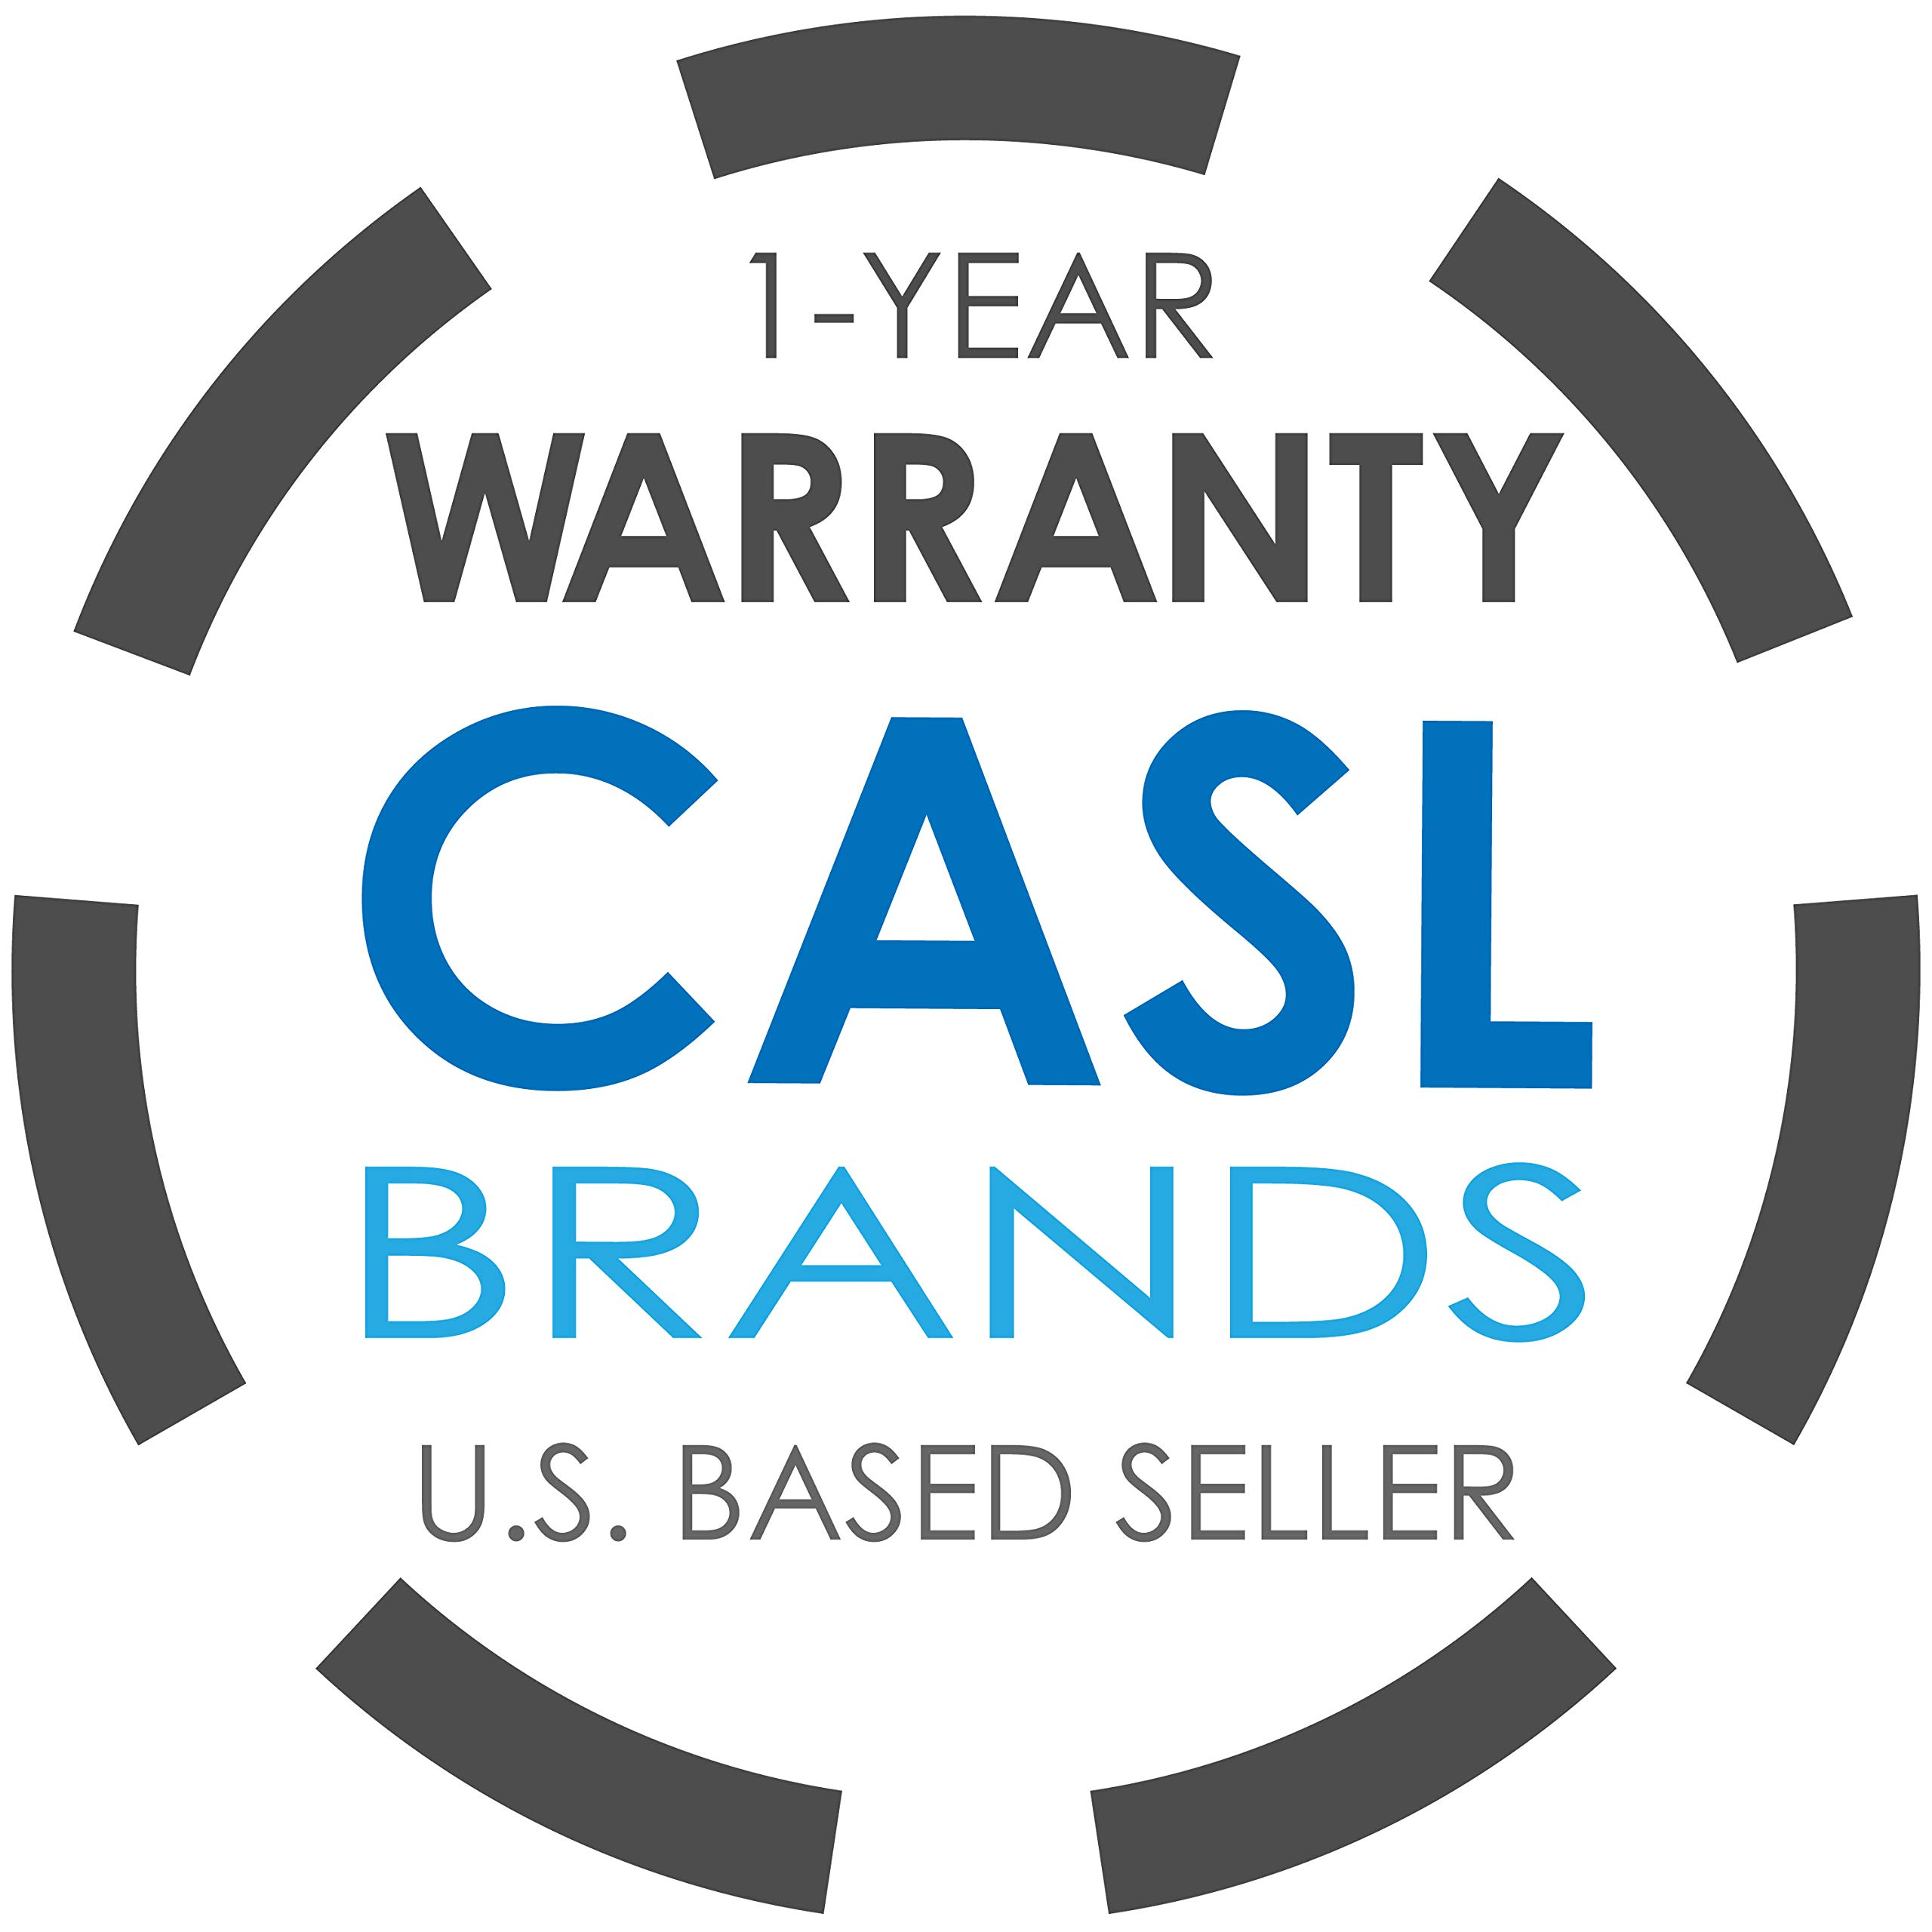 CASL Brands File Cabinet Cushion Seat Top for Mobile Pedestals, Magnetic Back, Blue by CASL Brands (Image #7)